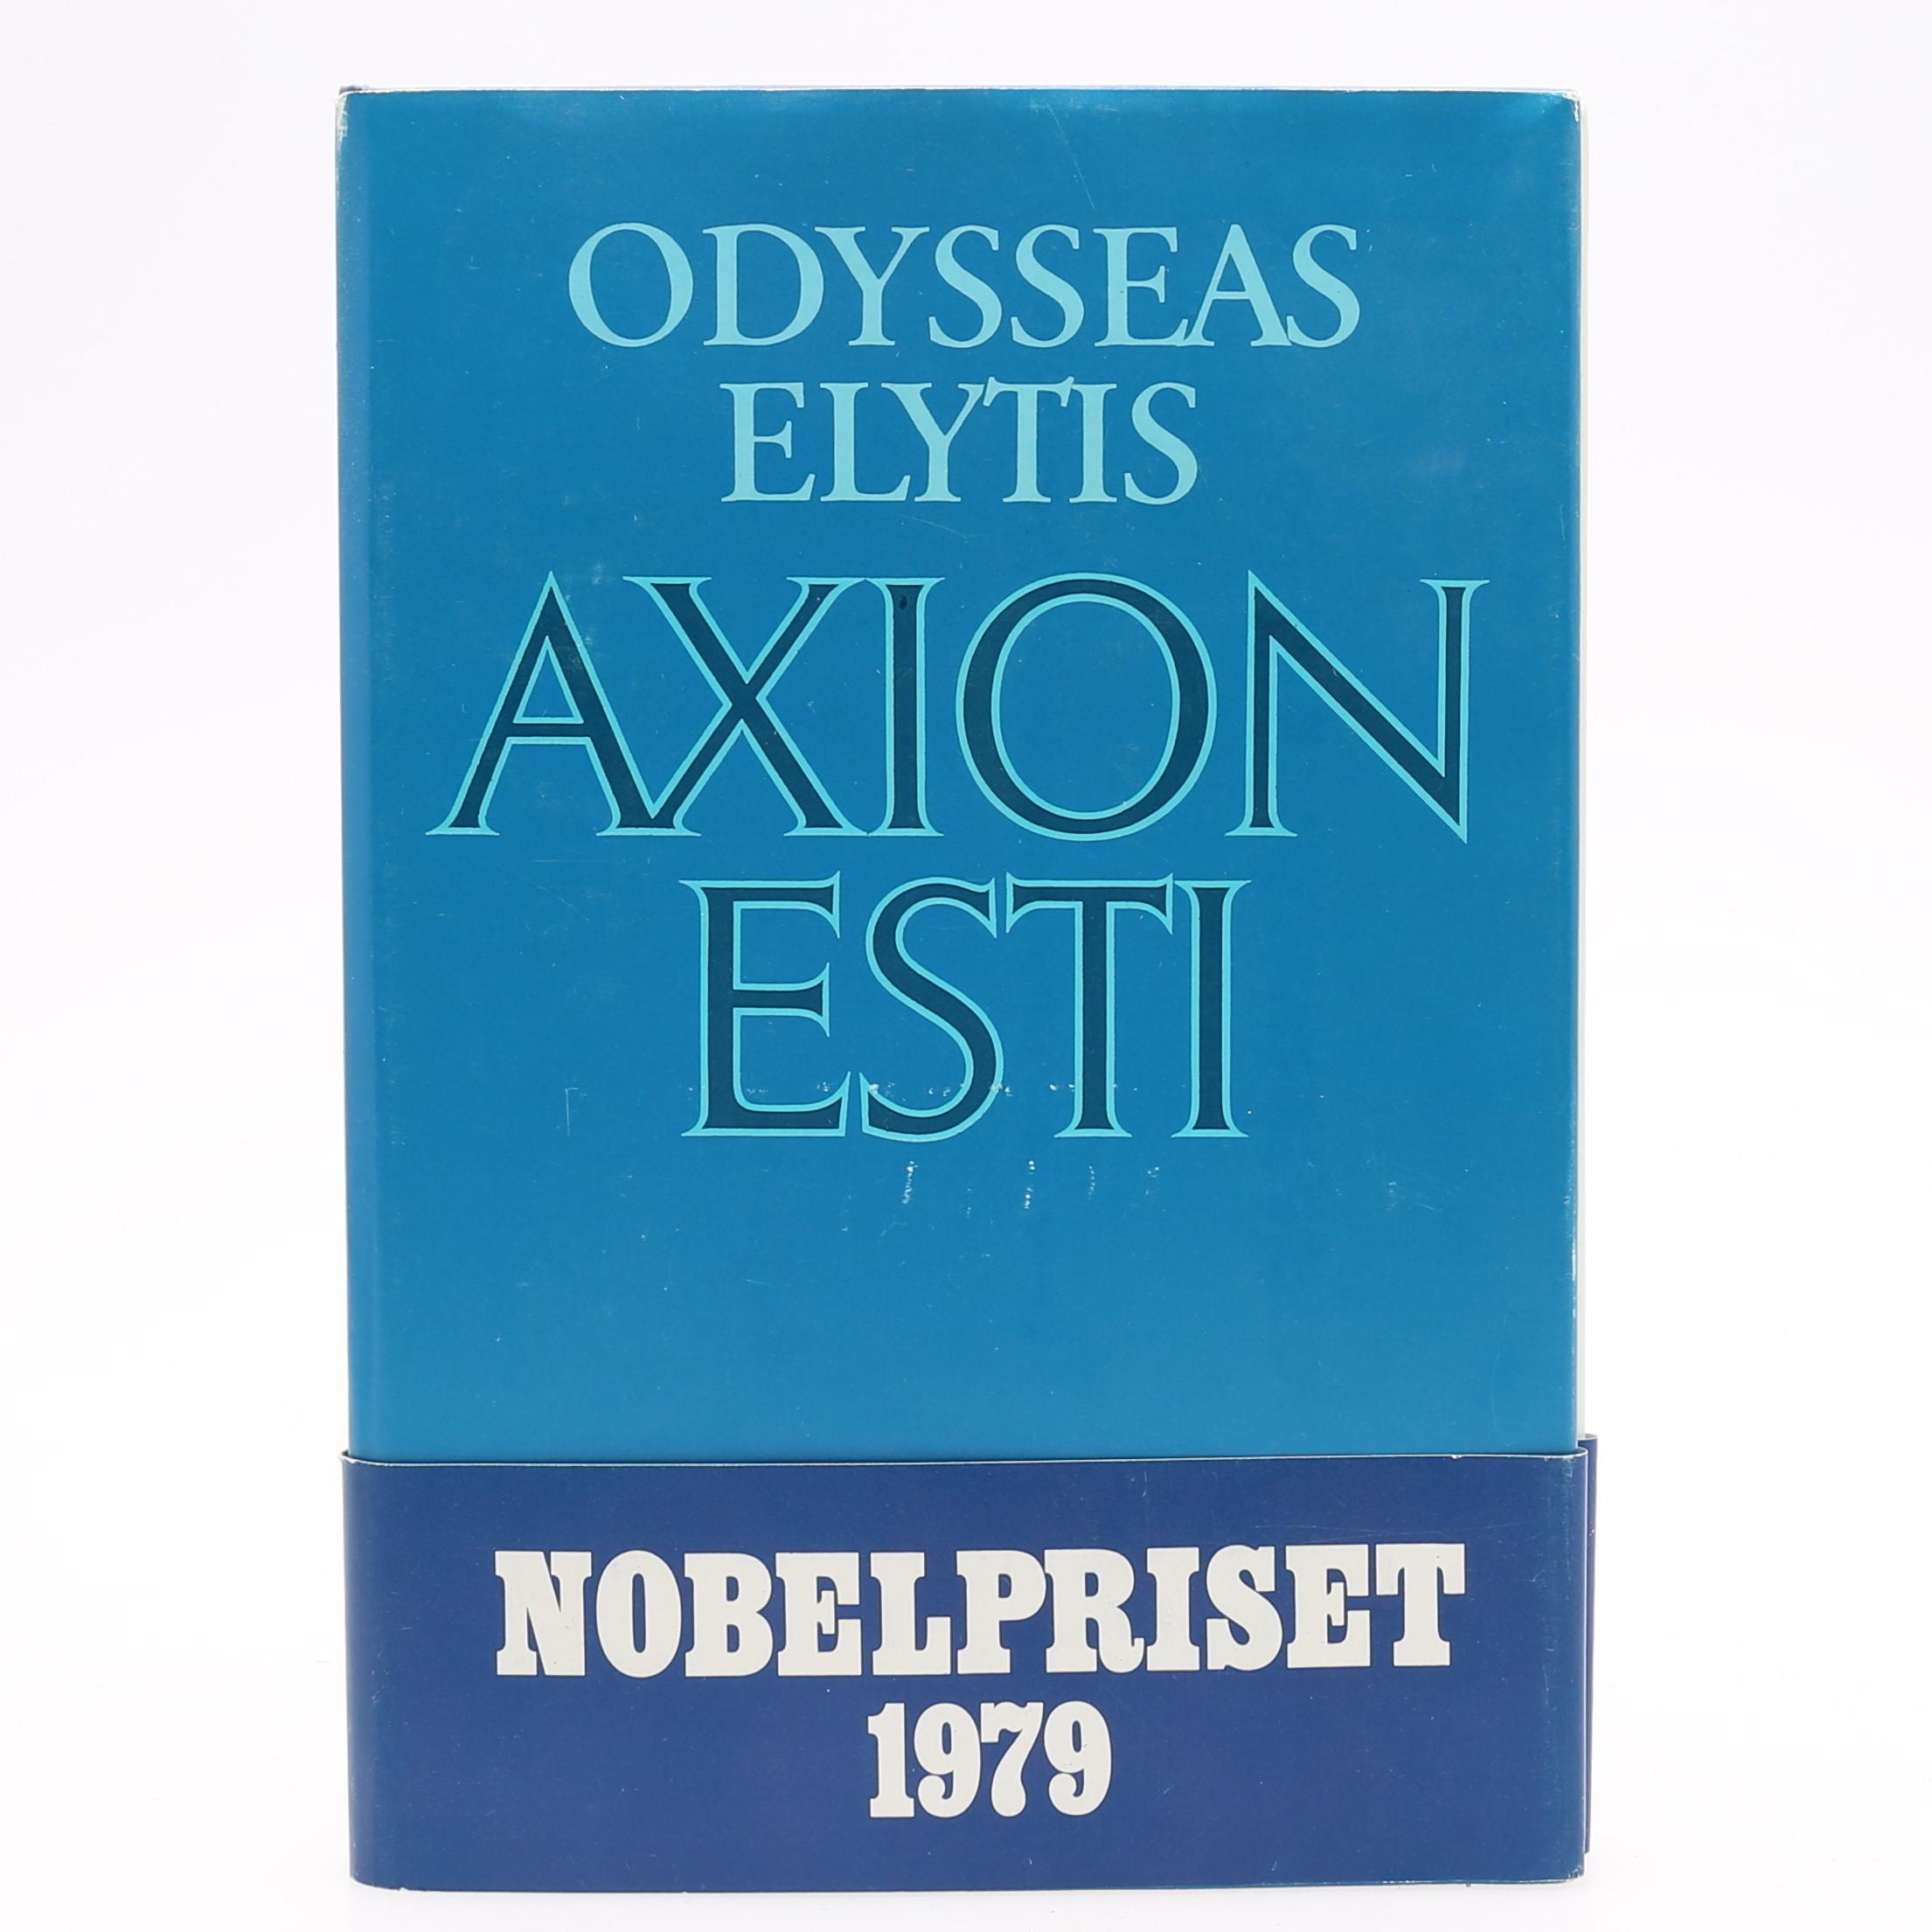 SIGNED BY ODYSSEAS ELYTIS NOBEL PRIZE WINNER IN LITERATURE 1979 Books Maps Manuscripts